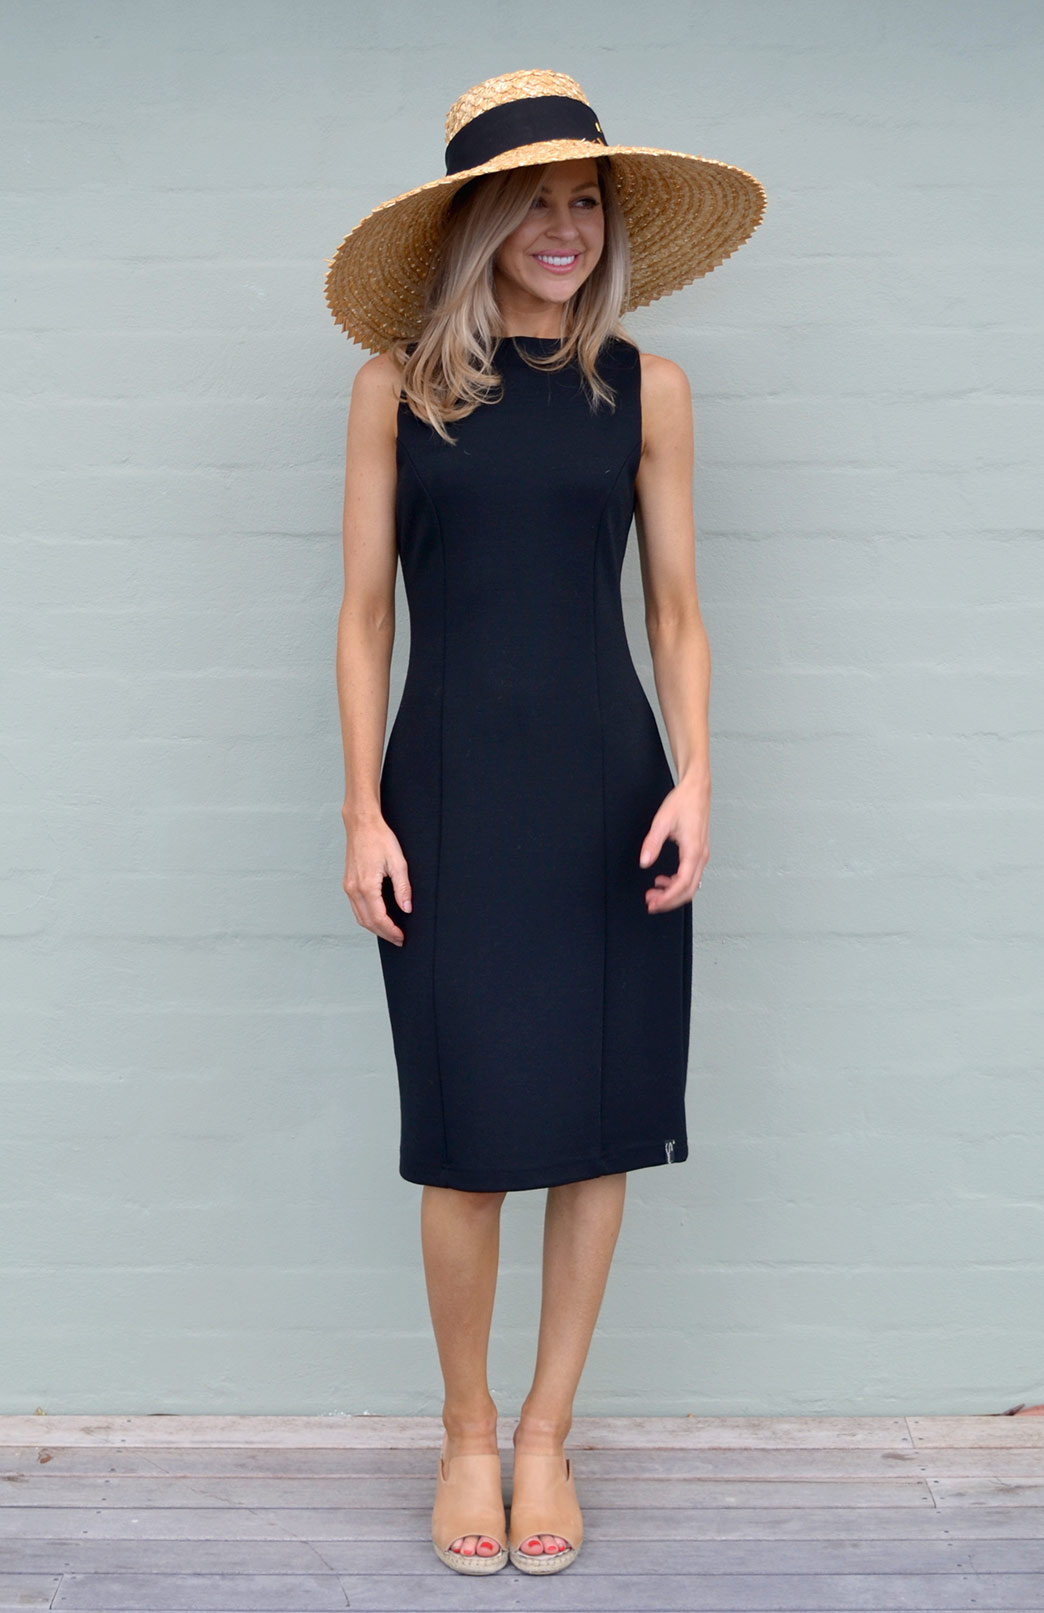 Missi Dress - Women's Black Merino Wool Ponte Dress with Full Back Zip and High Neckline - Smitten Merino Tasmania Australia